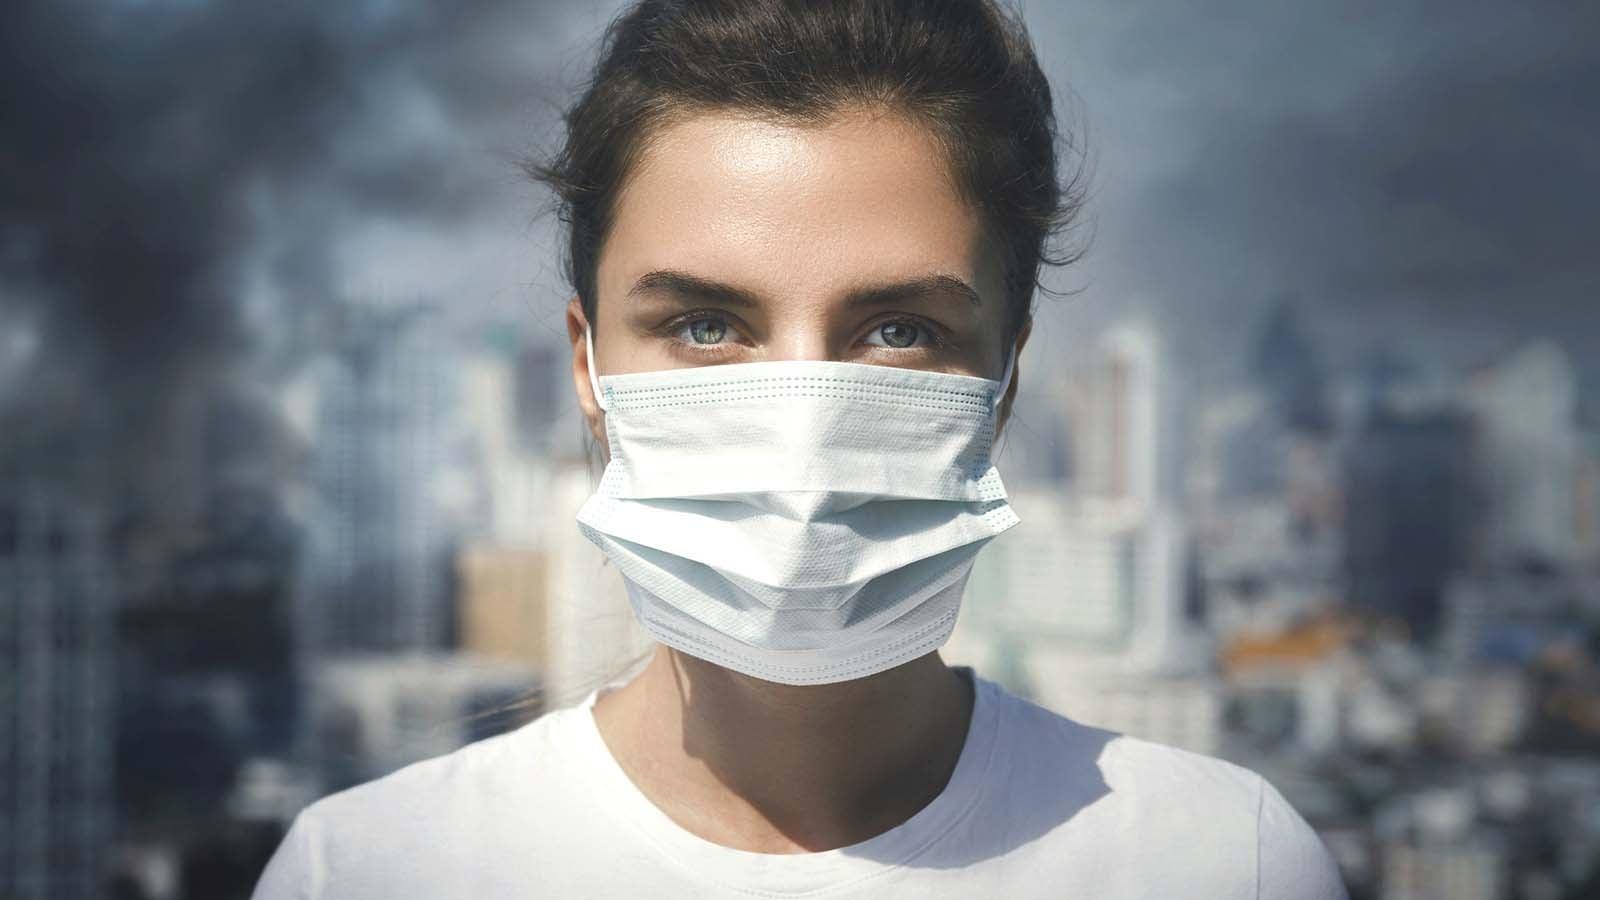 Feinstaub, Ozon: Luftverschmutzung verkürzt unser Leben um fast drei Jahre